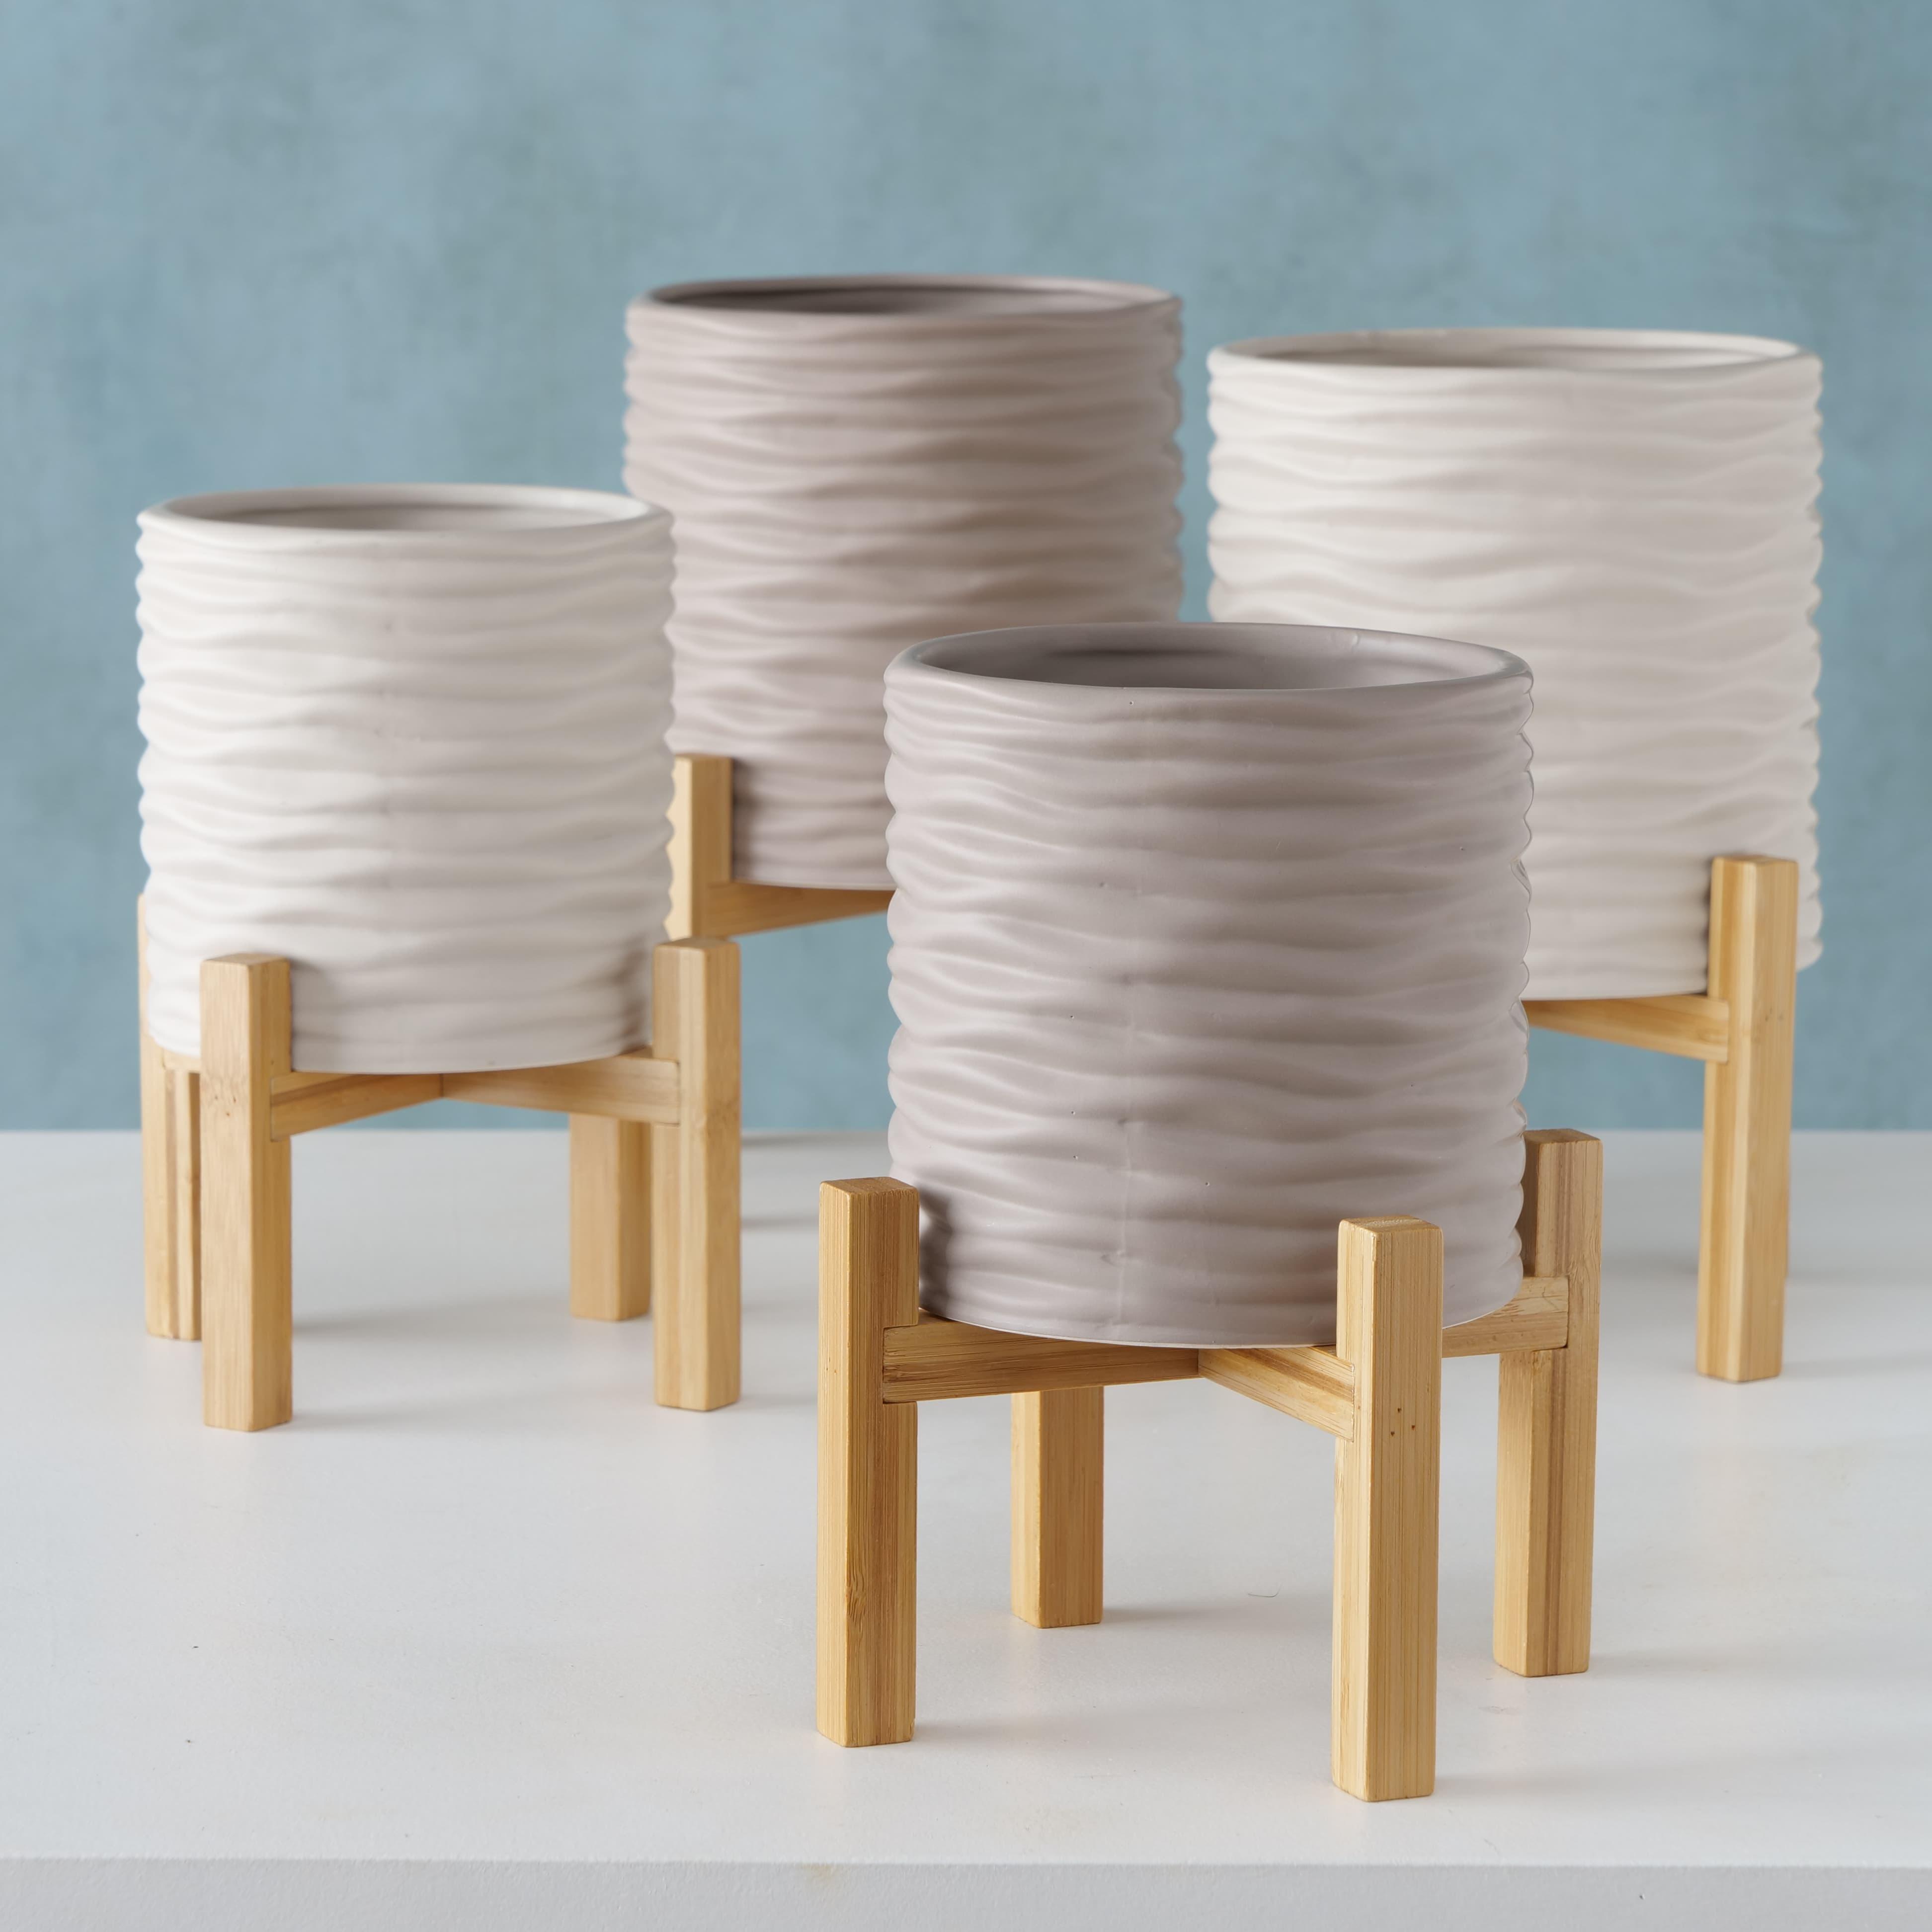 Set 2 ghivece din ceramica cu suport Iver Grej / Gri deschis, Modele Asortate, Ø22xH30 cm / Ø18xH25 cm